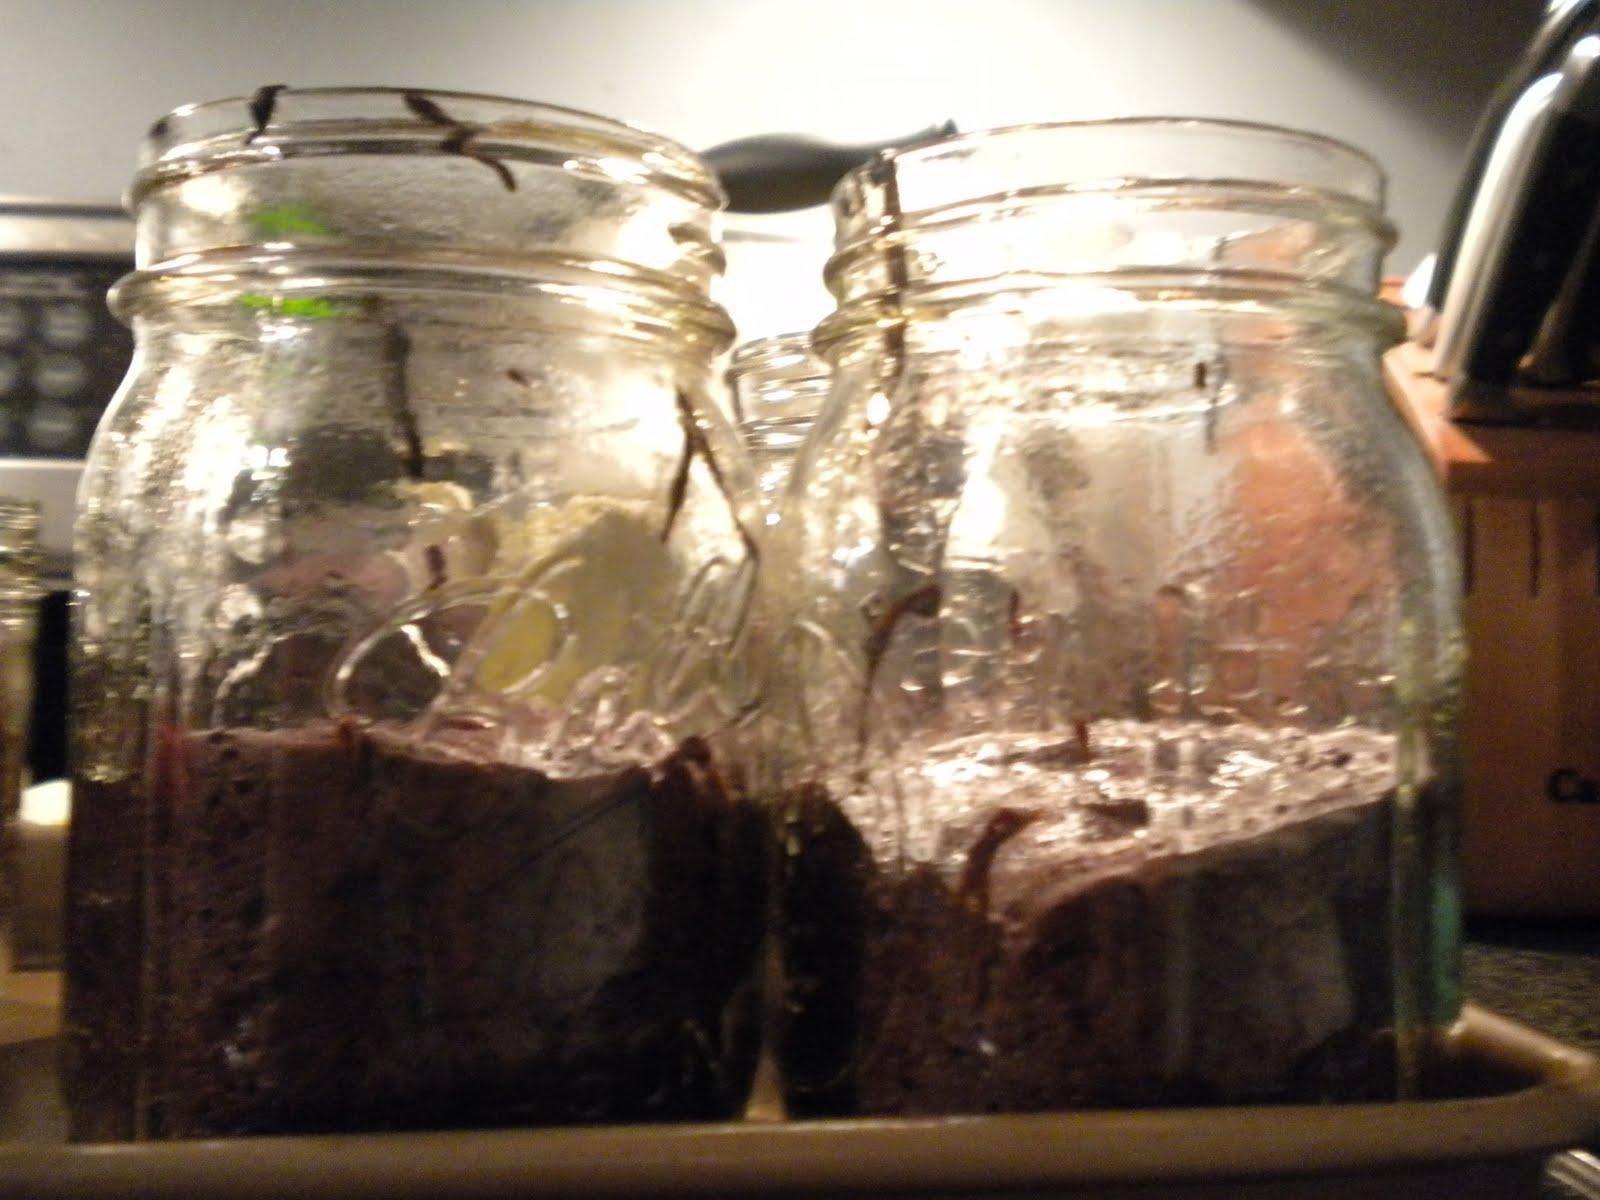 Cake In A Jar Recipe Microwave: Savory Flavors: Flourless Chocolate Cake In A Jar